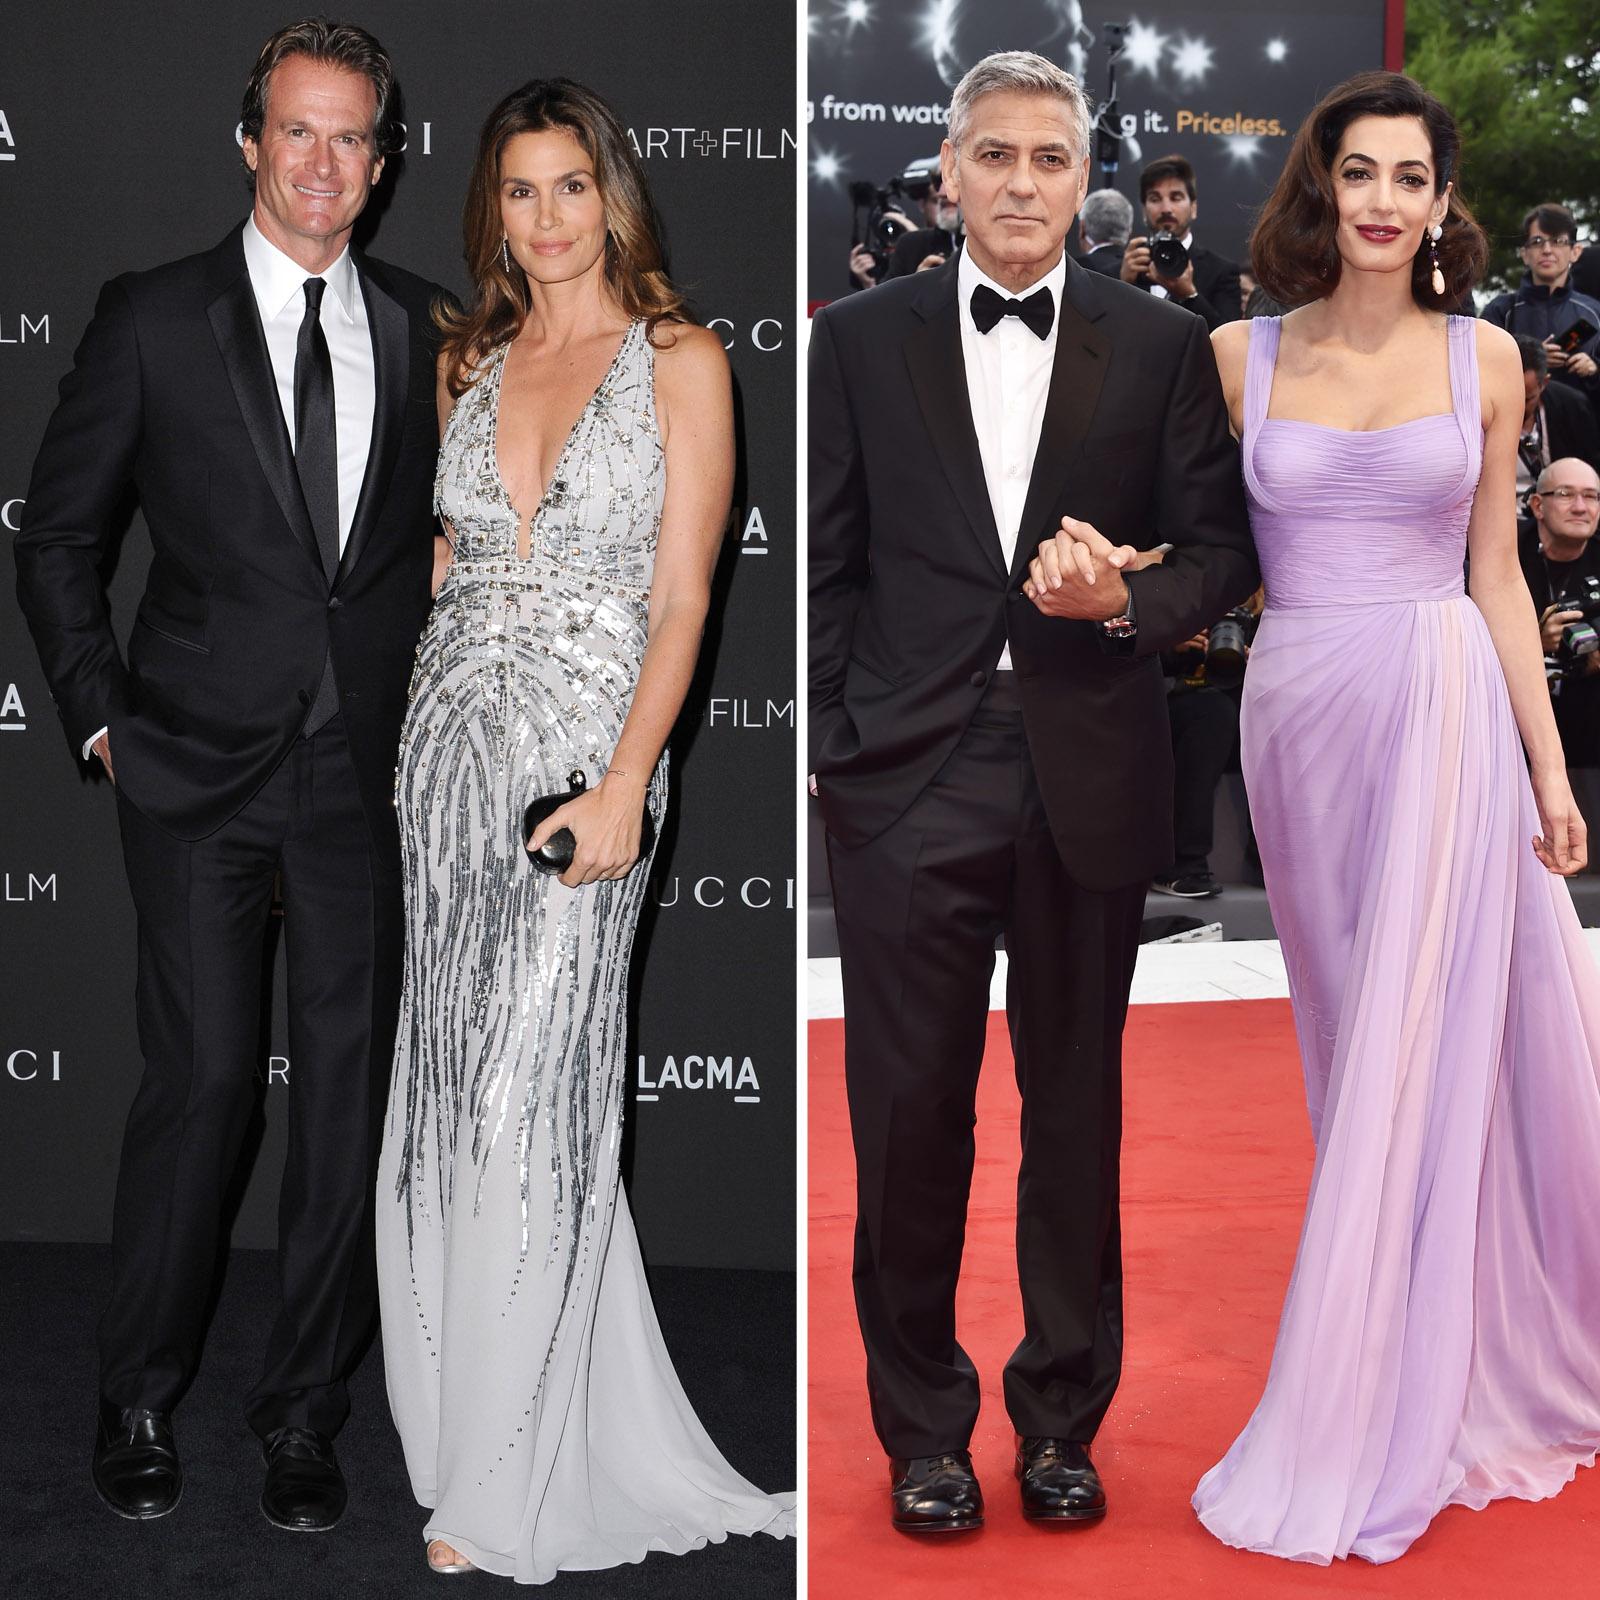 Cindy Crawford y Rande Gerber; George Clooney y Amal Clooney